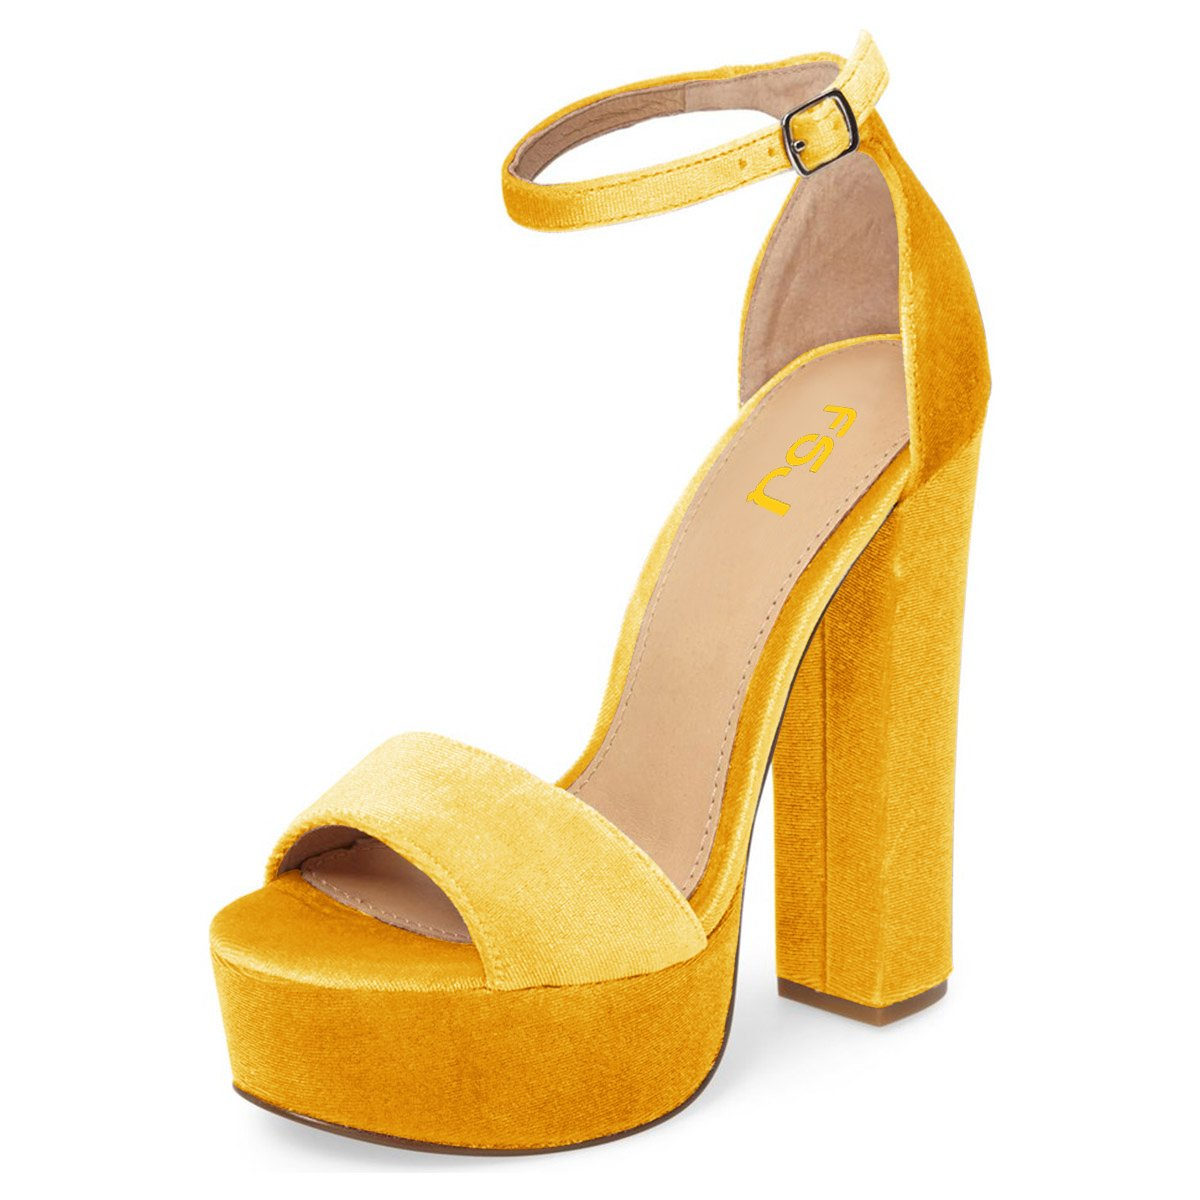 FSJ Women Sexy Ankle High Strap Platform Sandals Chunky High Ankle Heel Open Toe Velvet Shoes Size 4-15 US B0796LYC7R 14 B(M) US|Yellow d16156